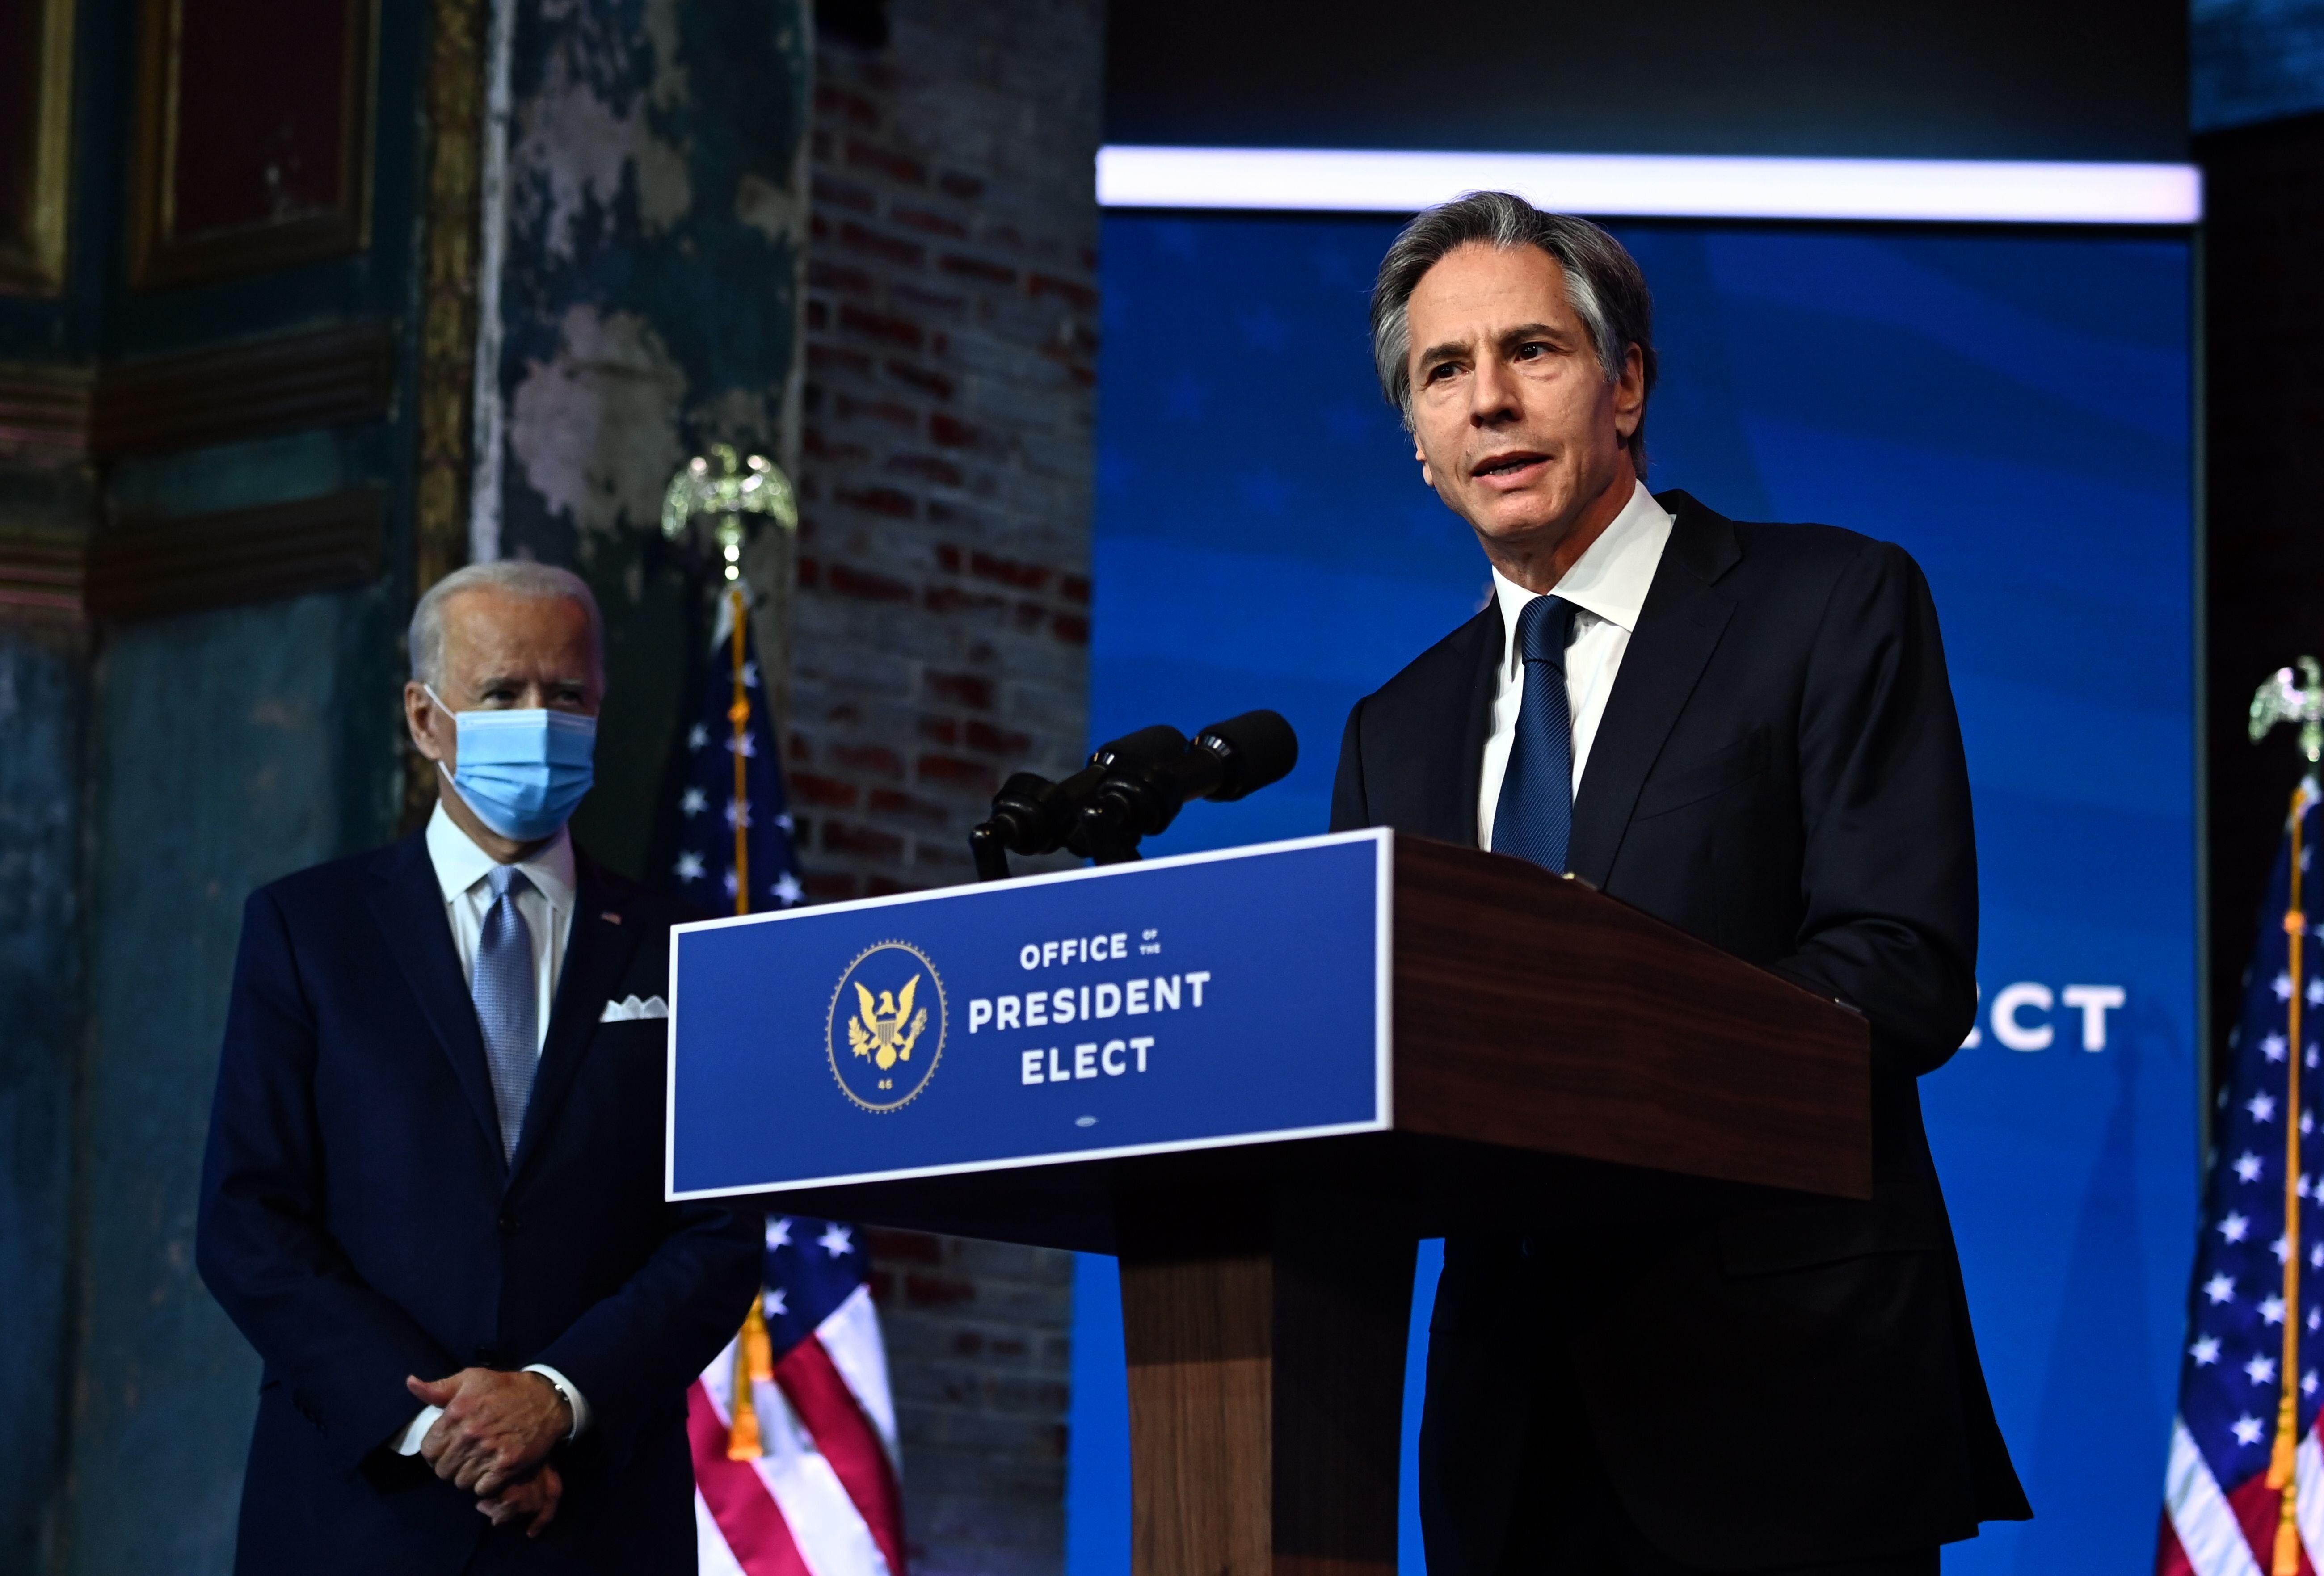 Antony Blinken, right, pictured on Nov. 24, 2020, hasties to Biden going back some 20 years.